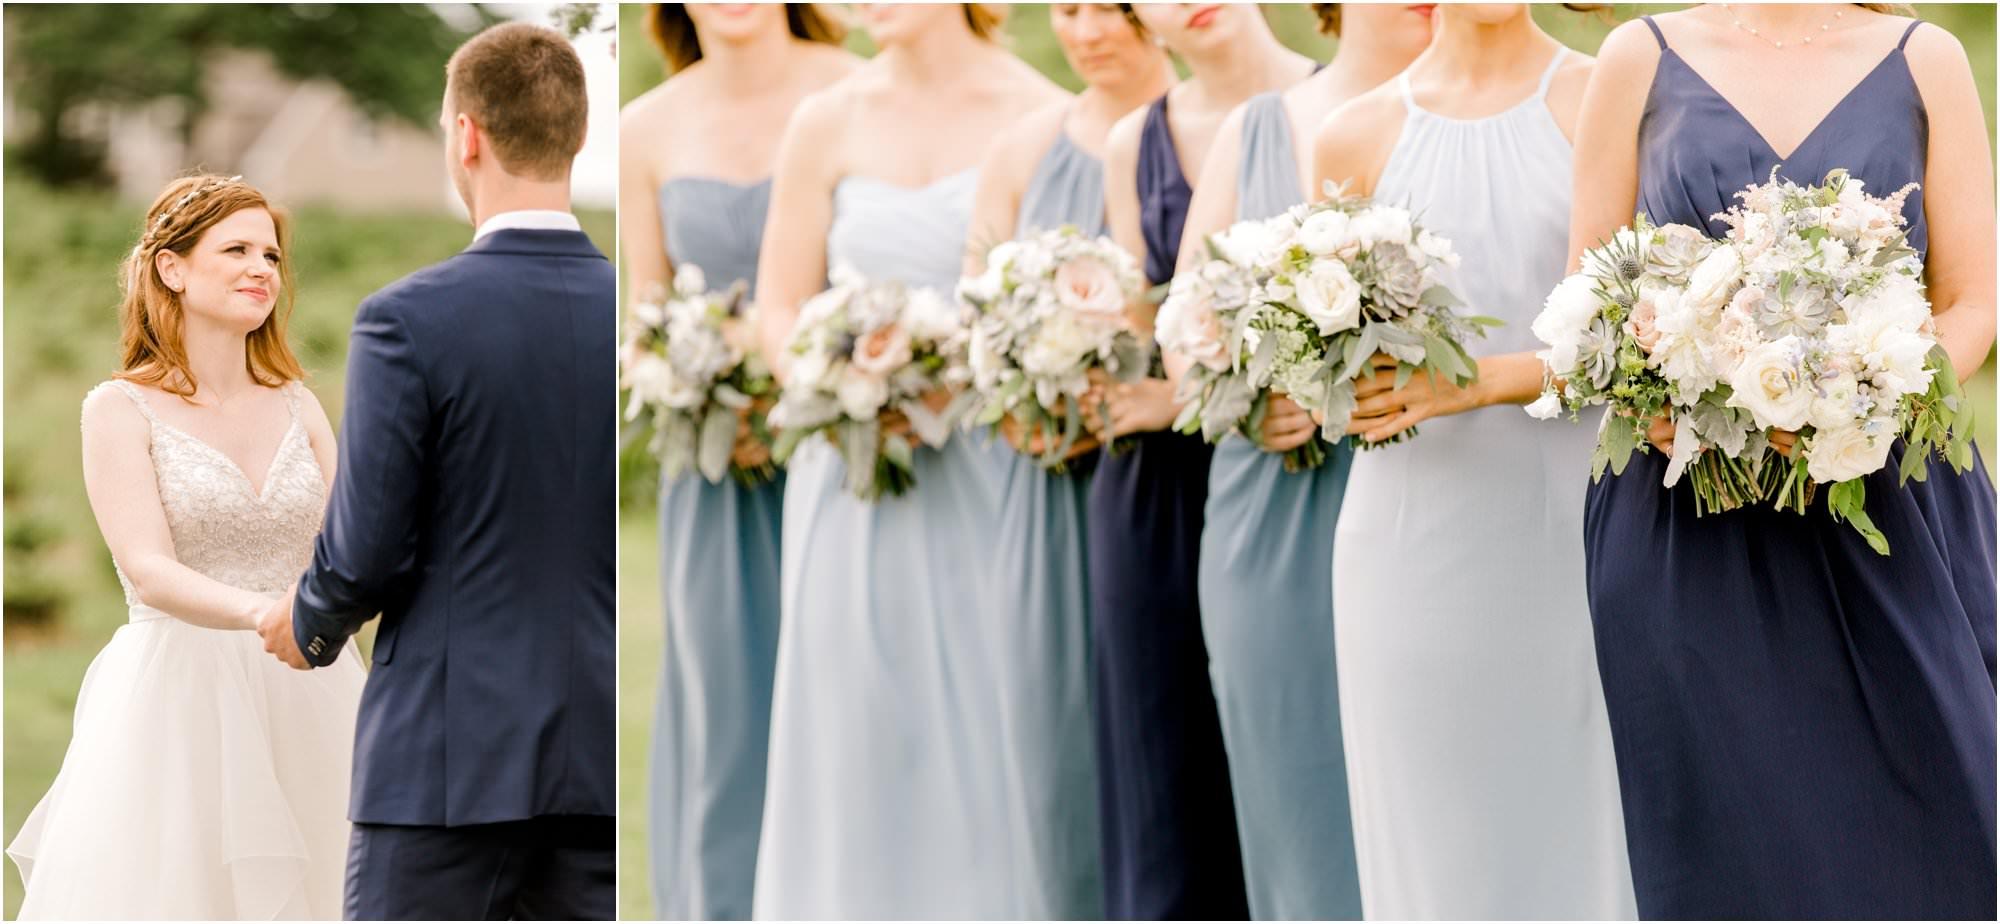 romantic allen hill farm wedding